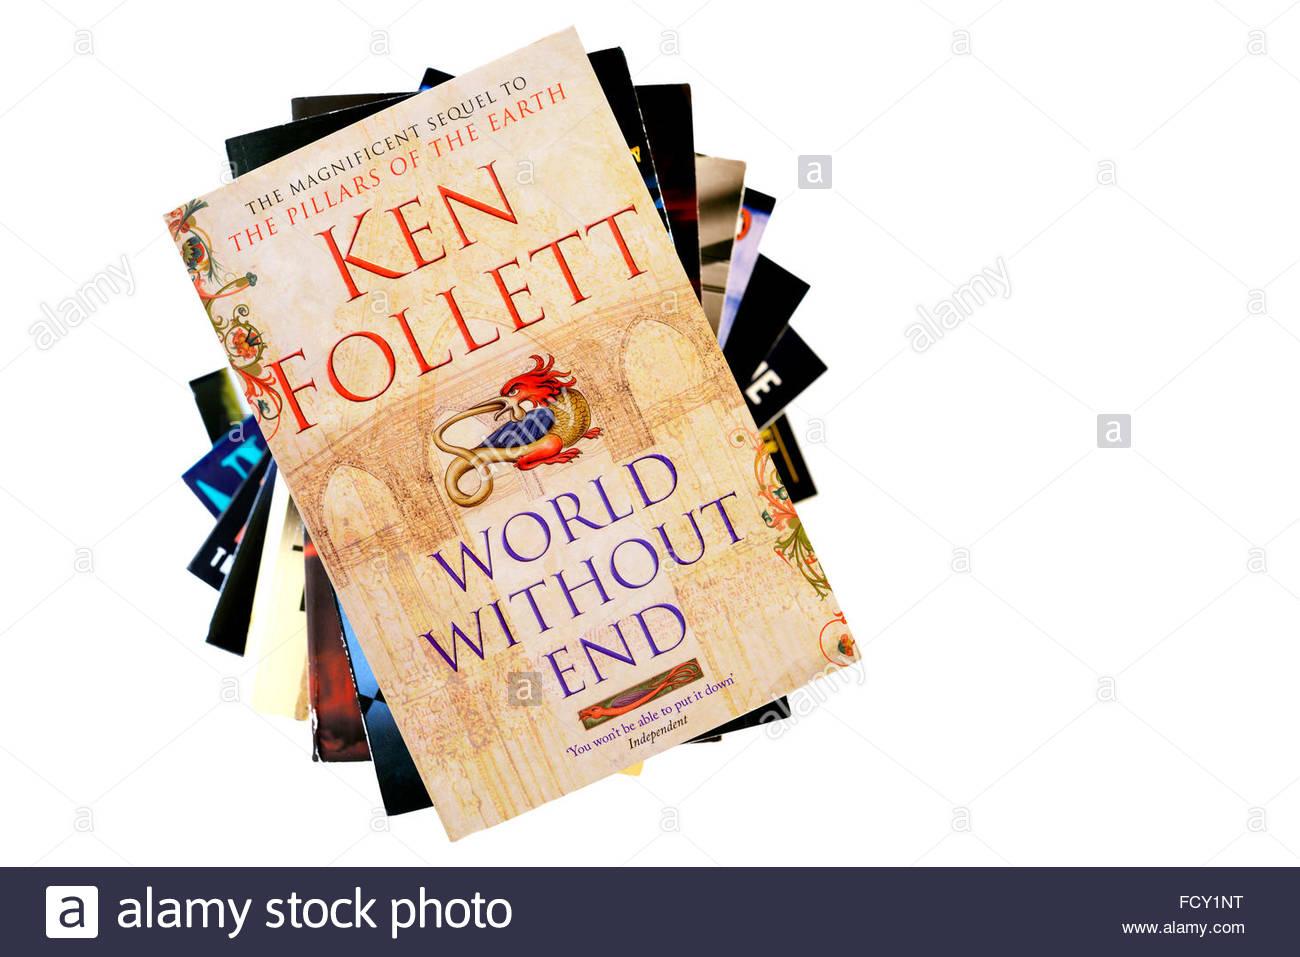 Ken Follett 2007 novel World Without End, stacked used books, England - Stock Image